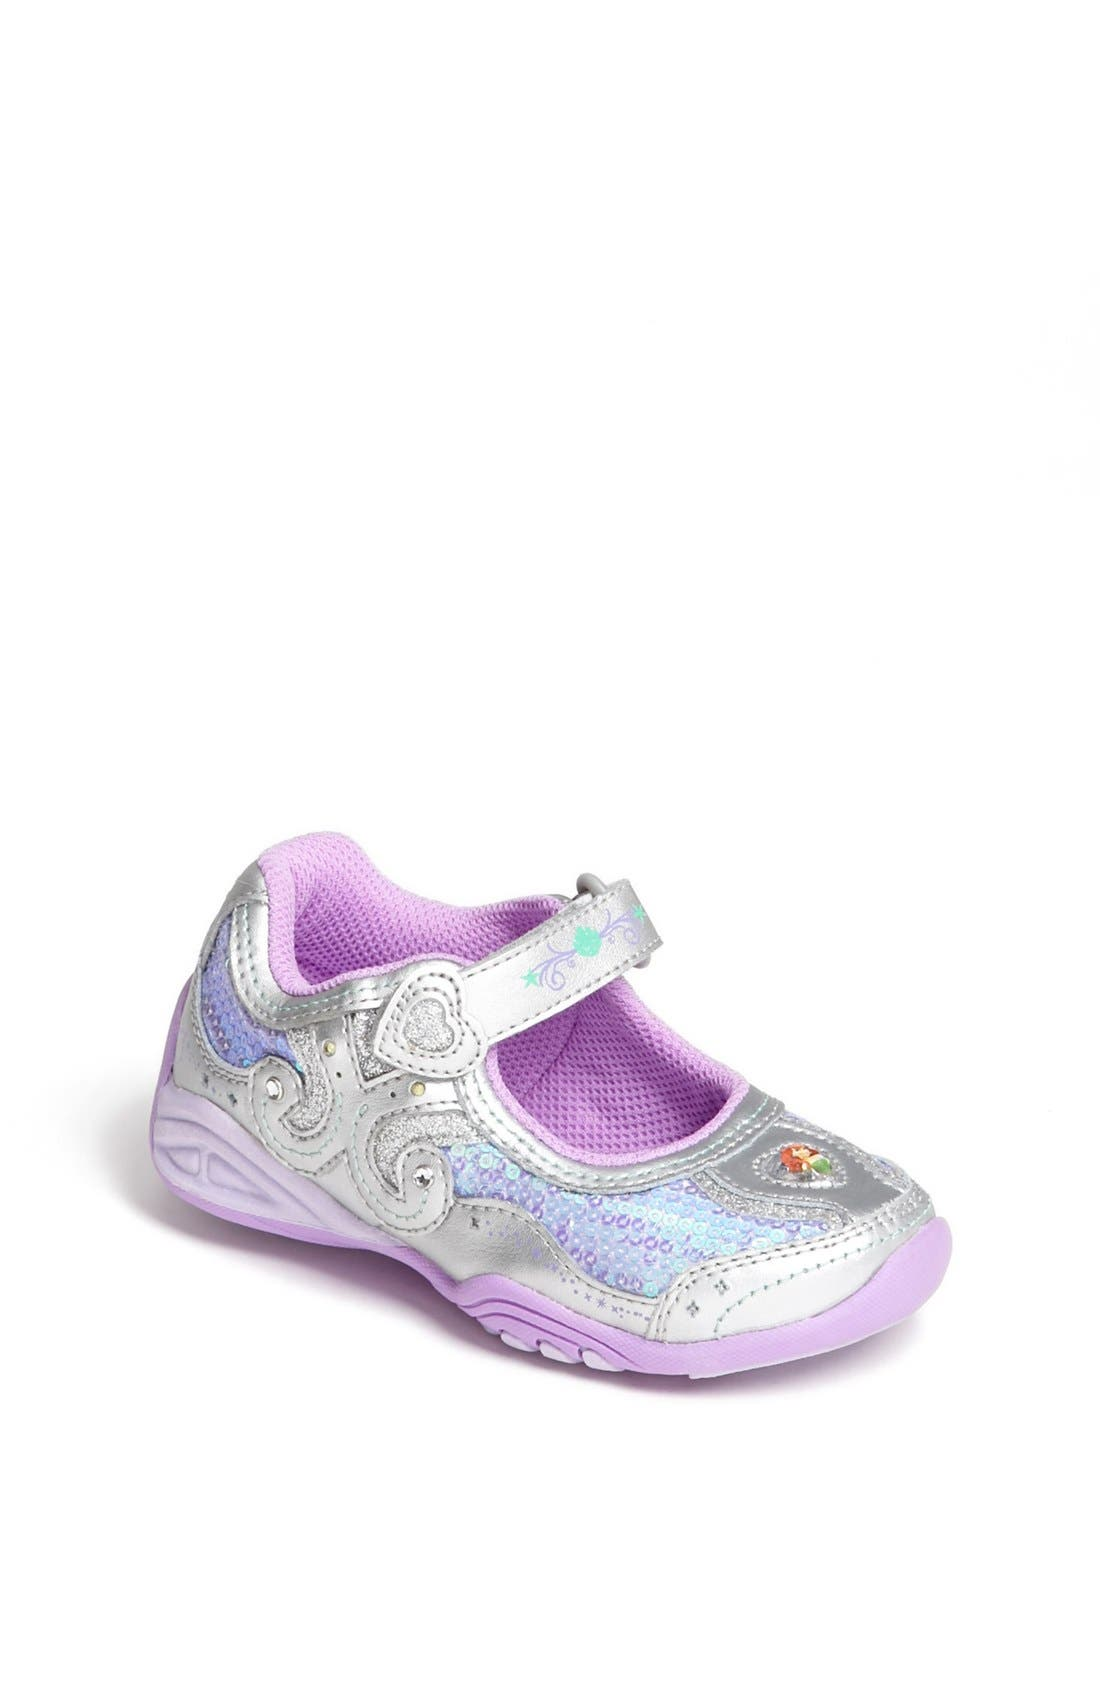 Alternate Image 1 Selected - Stride Rite 'Disney Wish Lights  - Ariel'  Sneaker (Toddler & Little Kid)